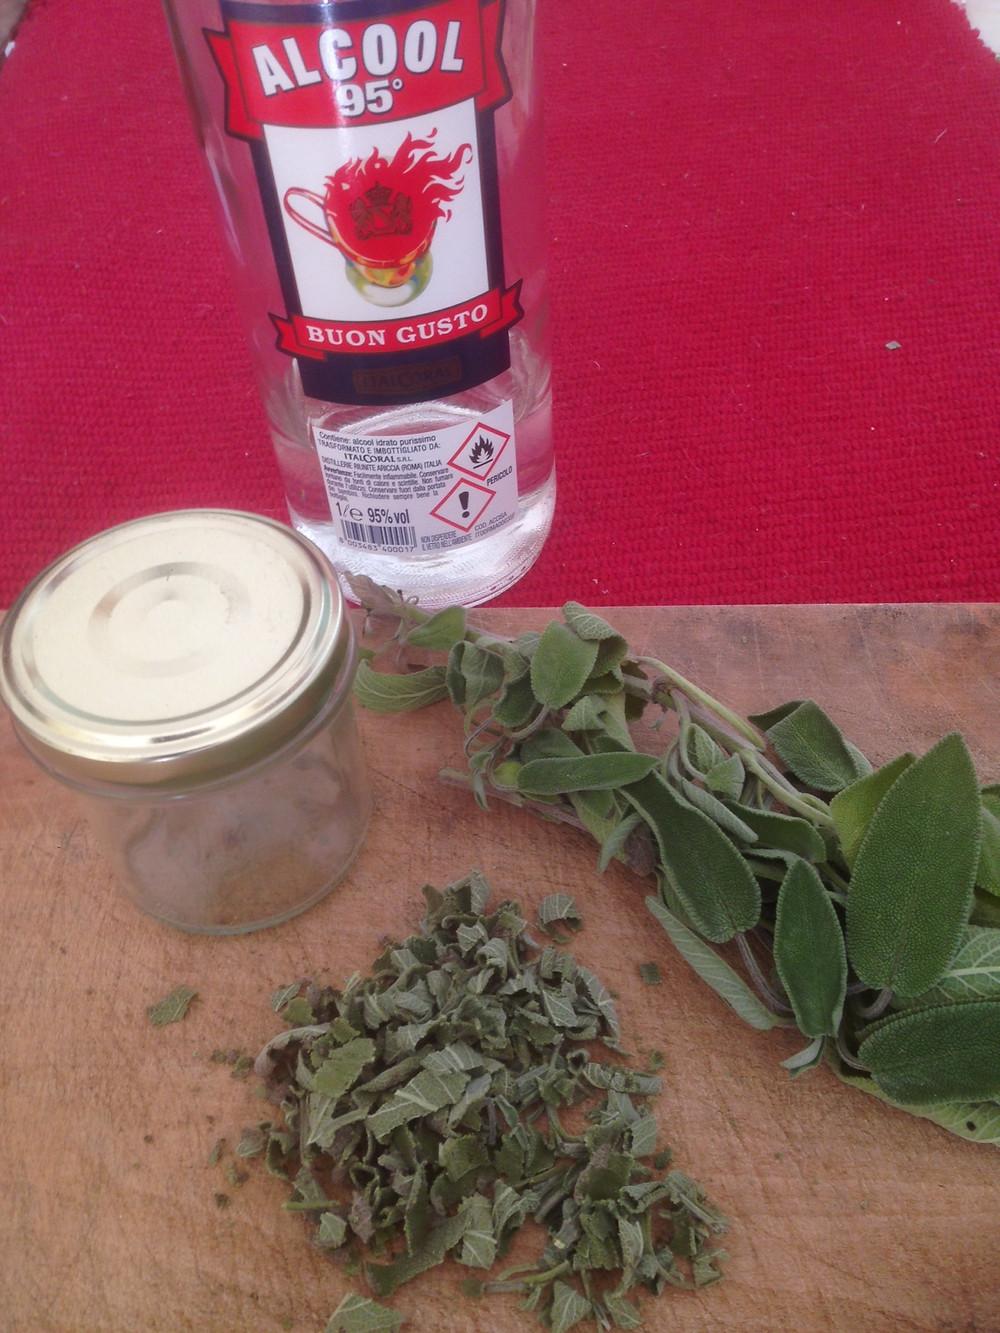 Tinktur #Salbeitinktur Alkohol 95% Salbei Kräuterauszug #DIY Deo